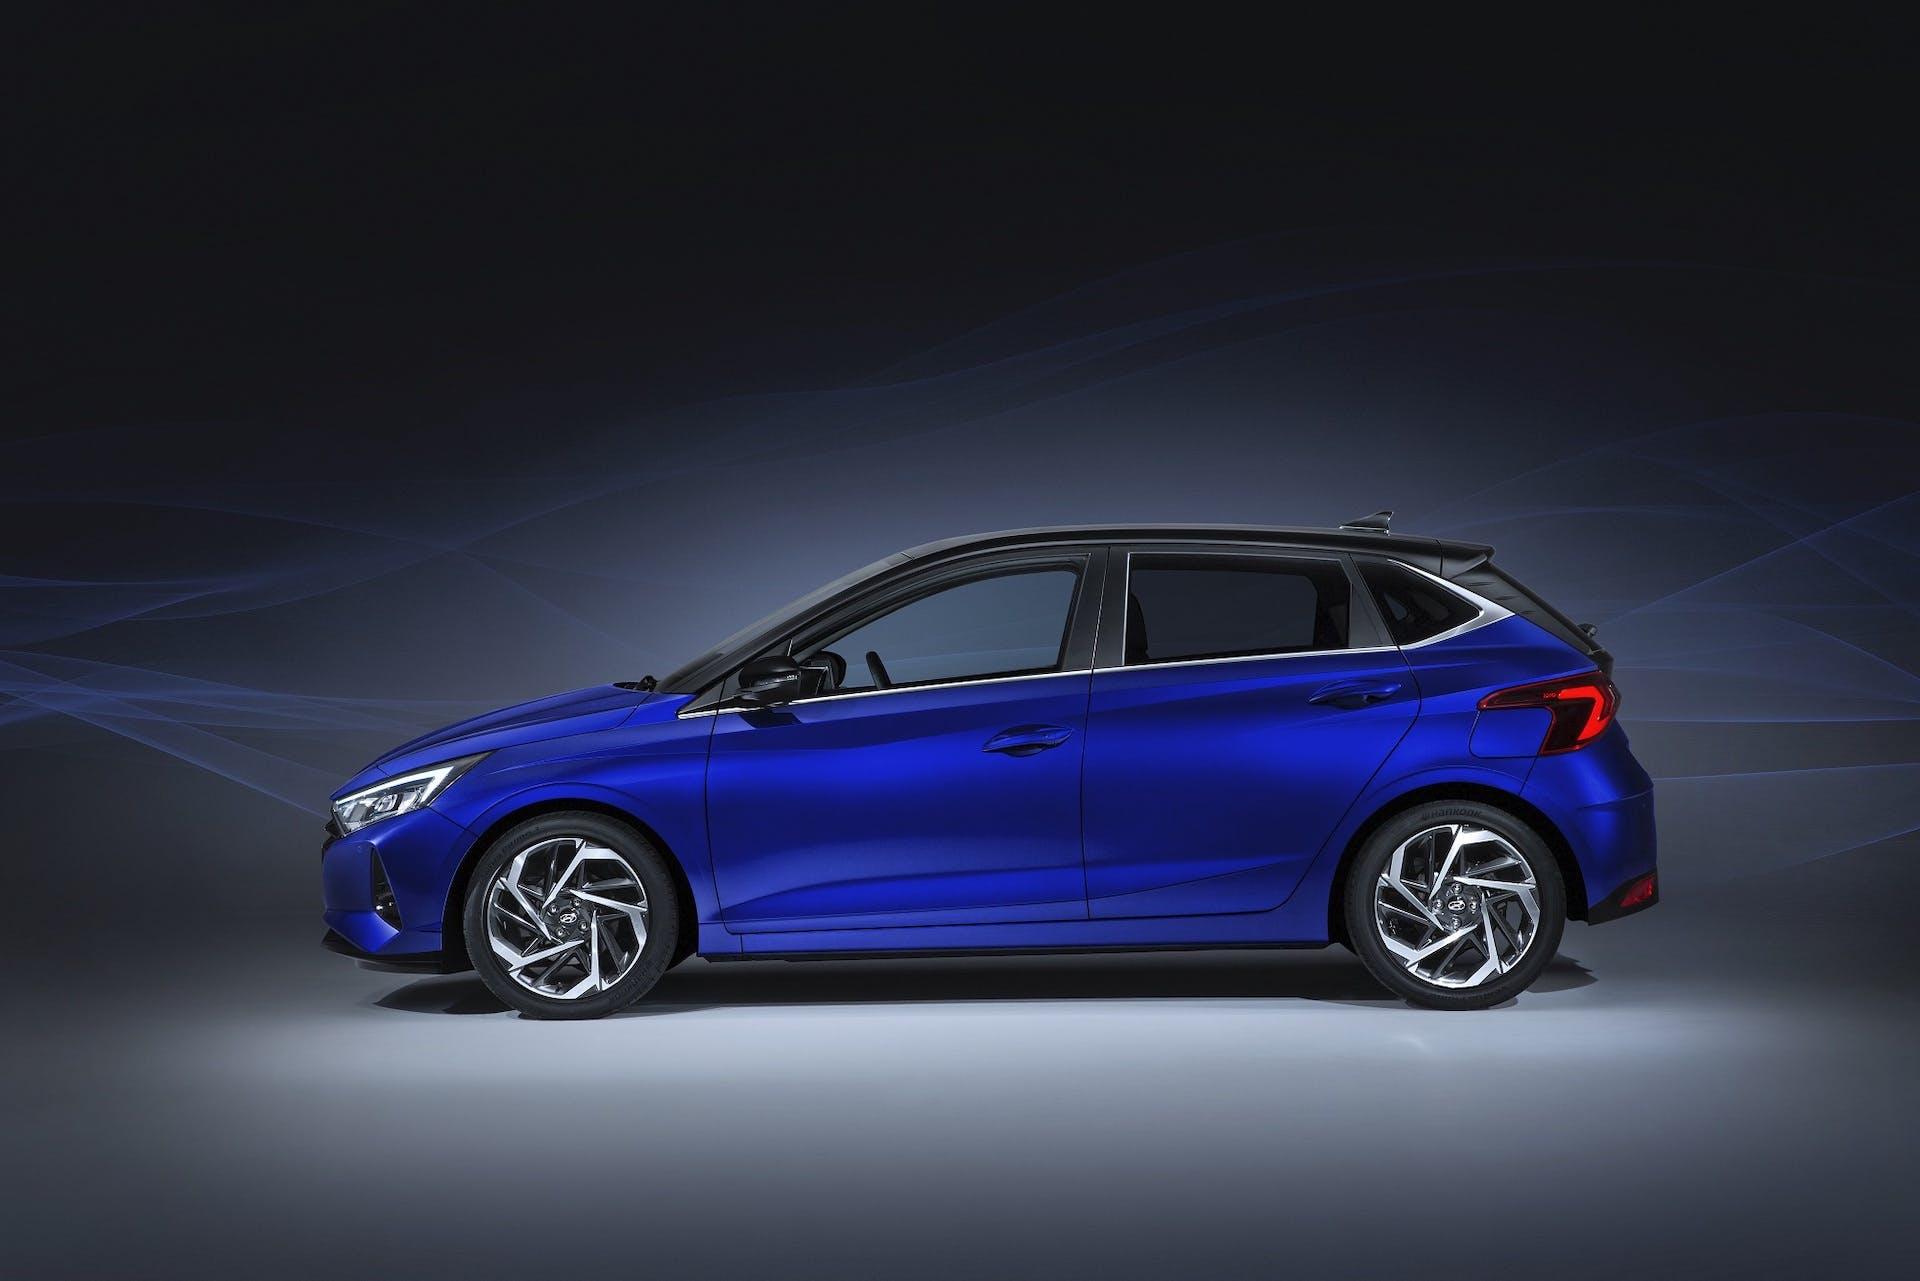 Nuova Hyundai i20 vista laterale